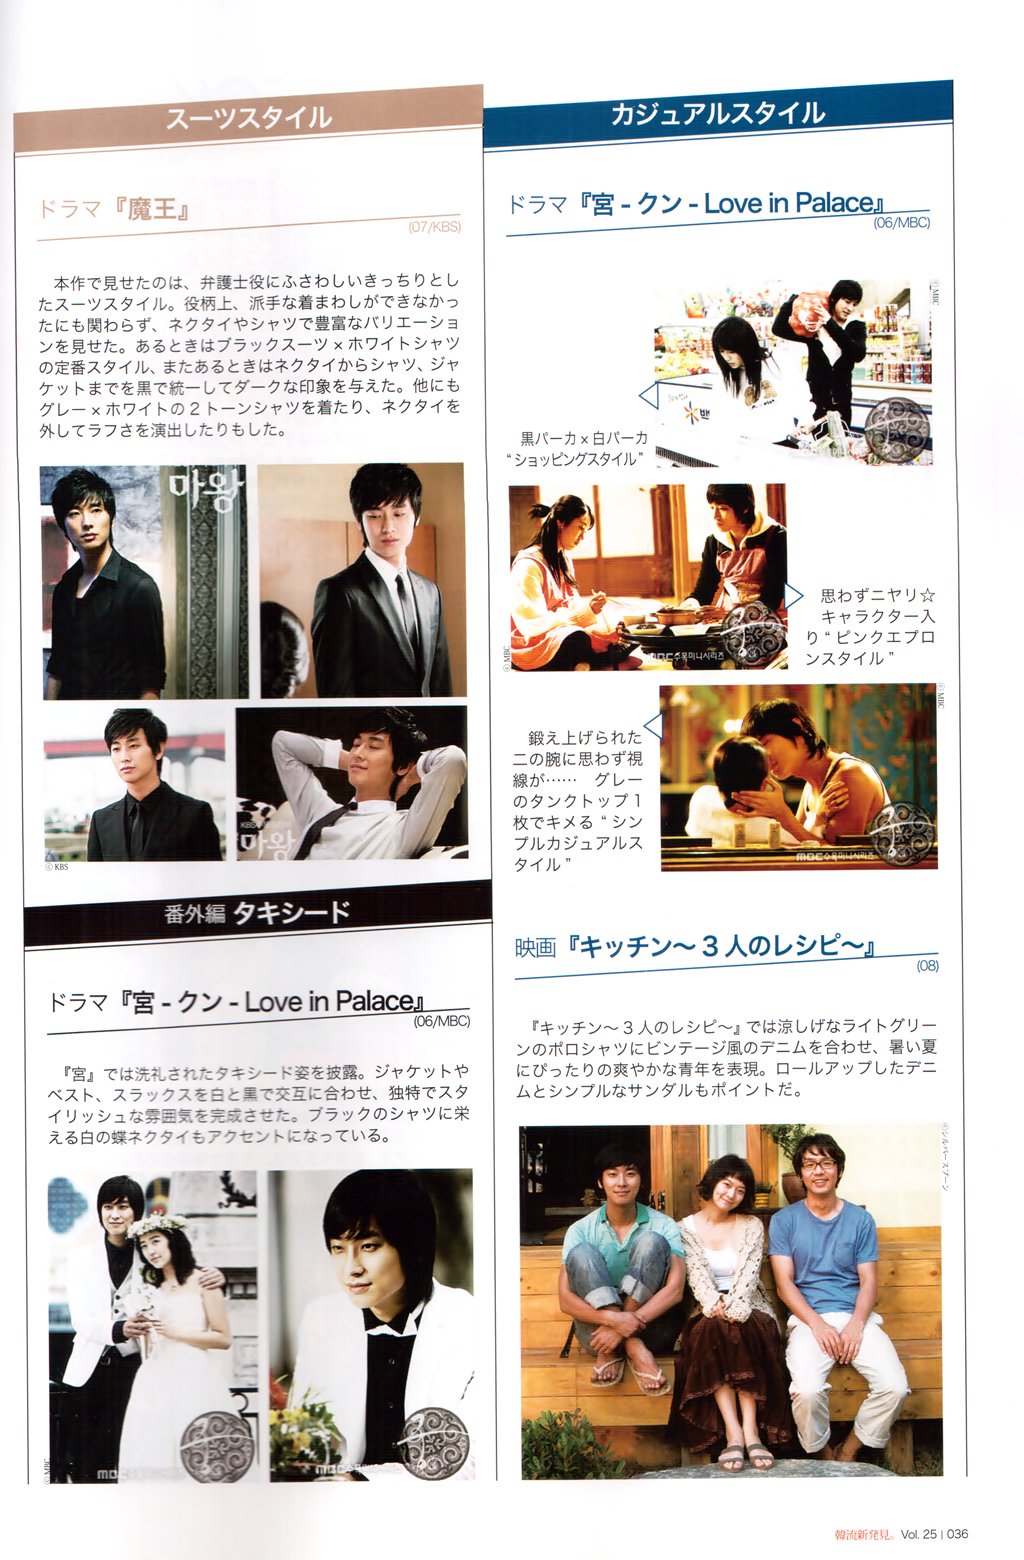 KEJ PART 4 衣裝CHECK (2)